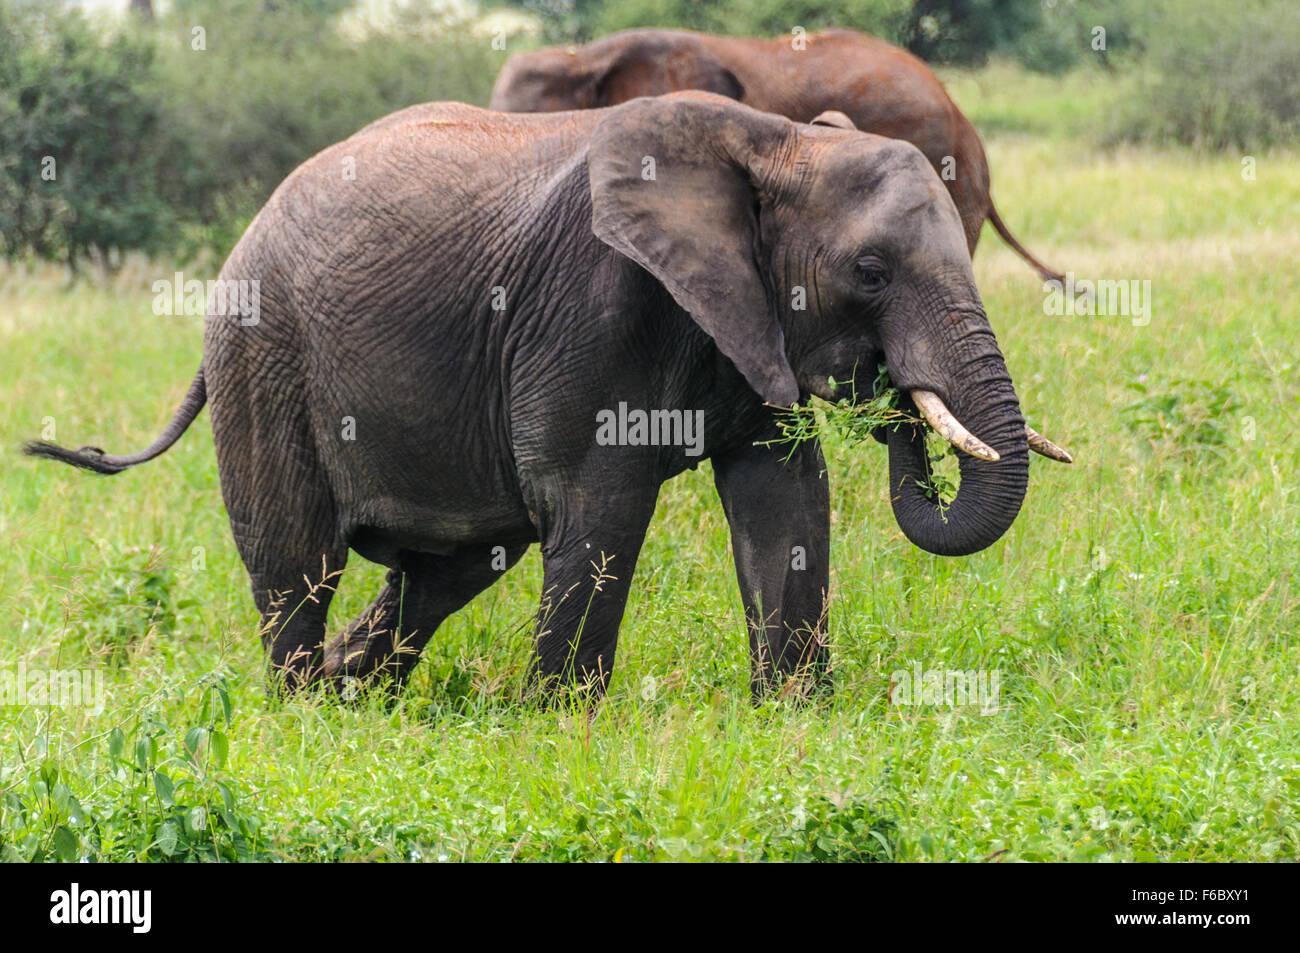 Comer elefantes en el Parque Nacional Tarangire, Tanzania Imagen De Stock